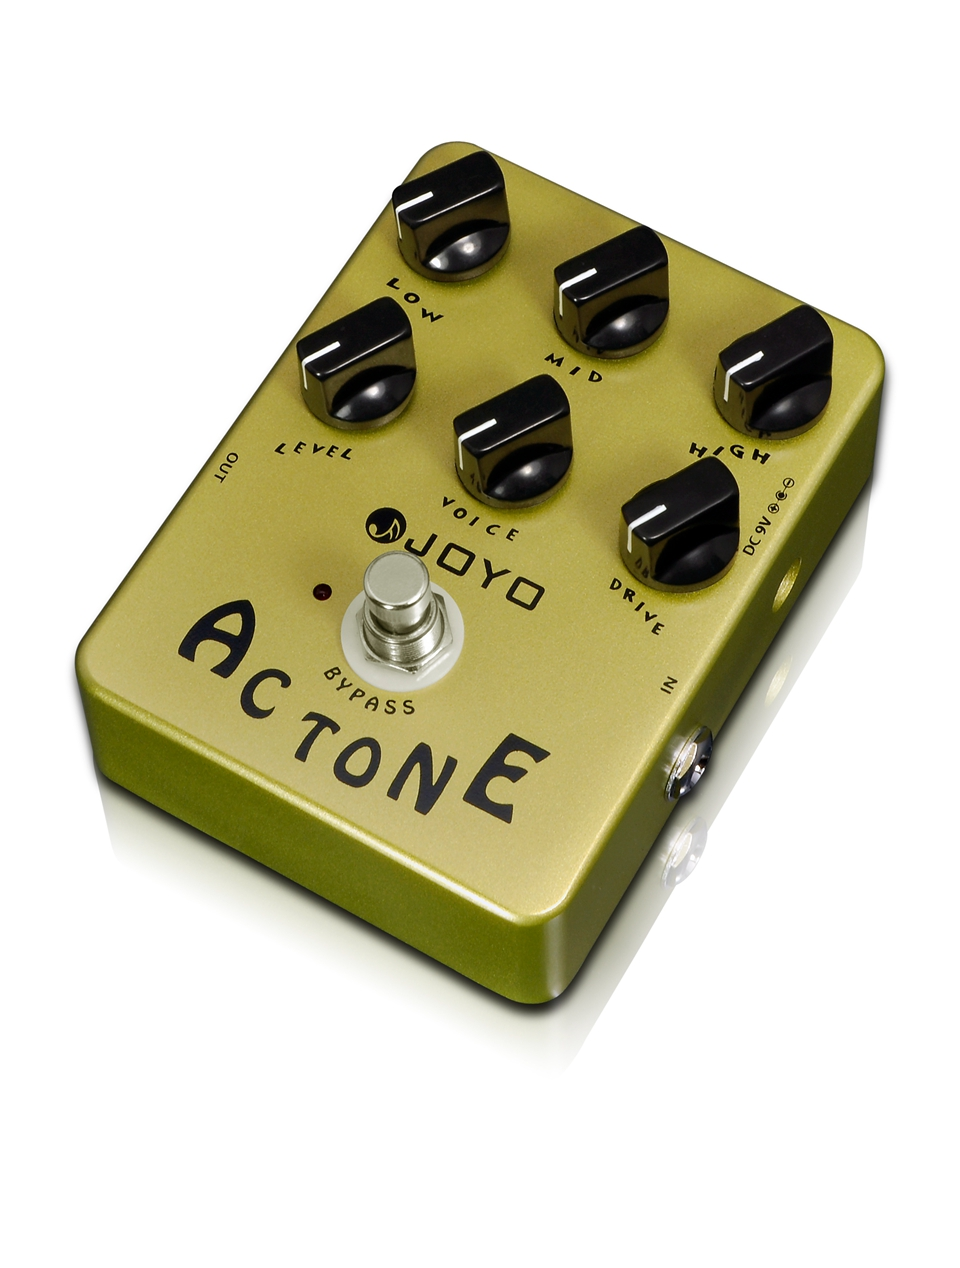 JOYO AC Tone Guitar Effect Pedal Classic British Rock Sound Reproduces The Sound Of A Vox AC30 Amplifier